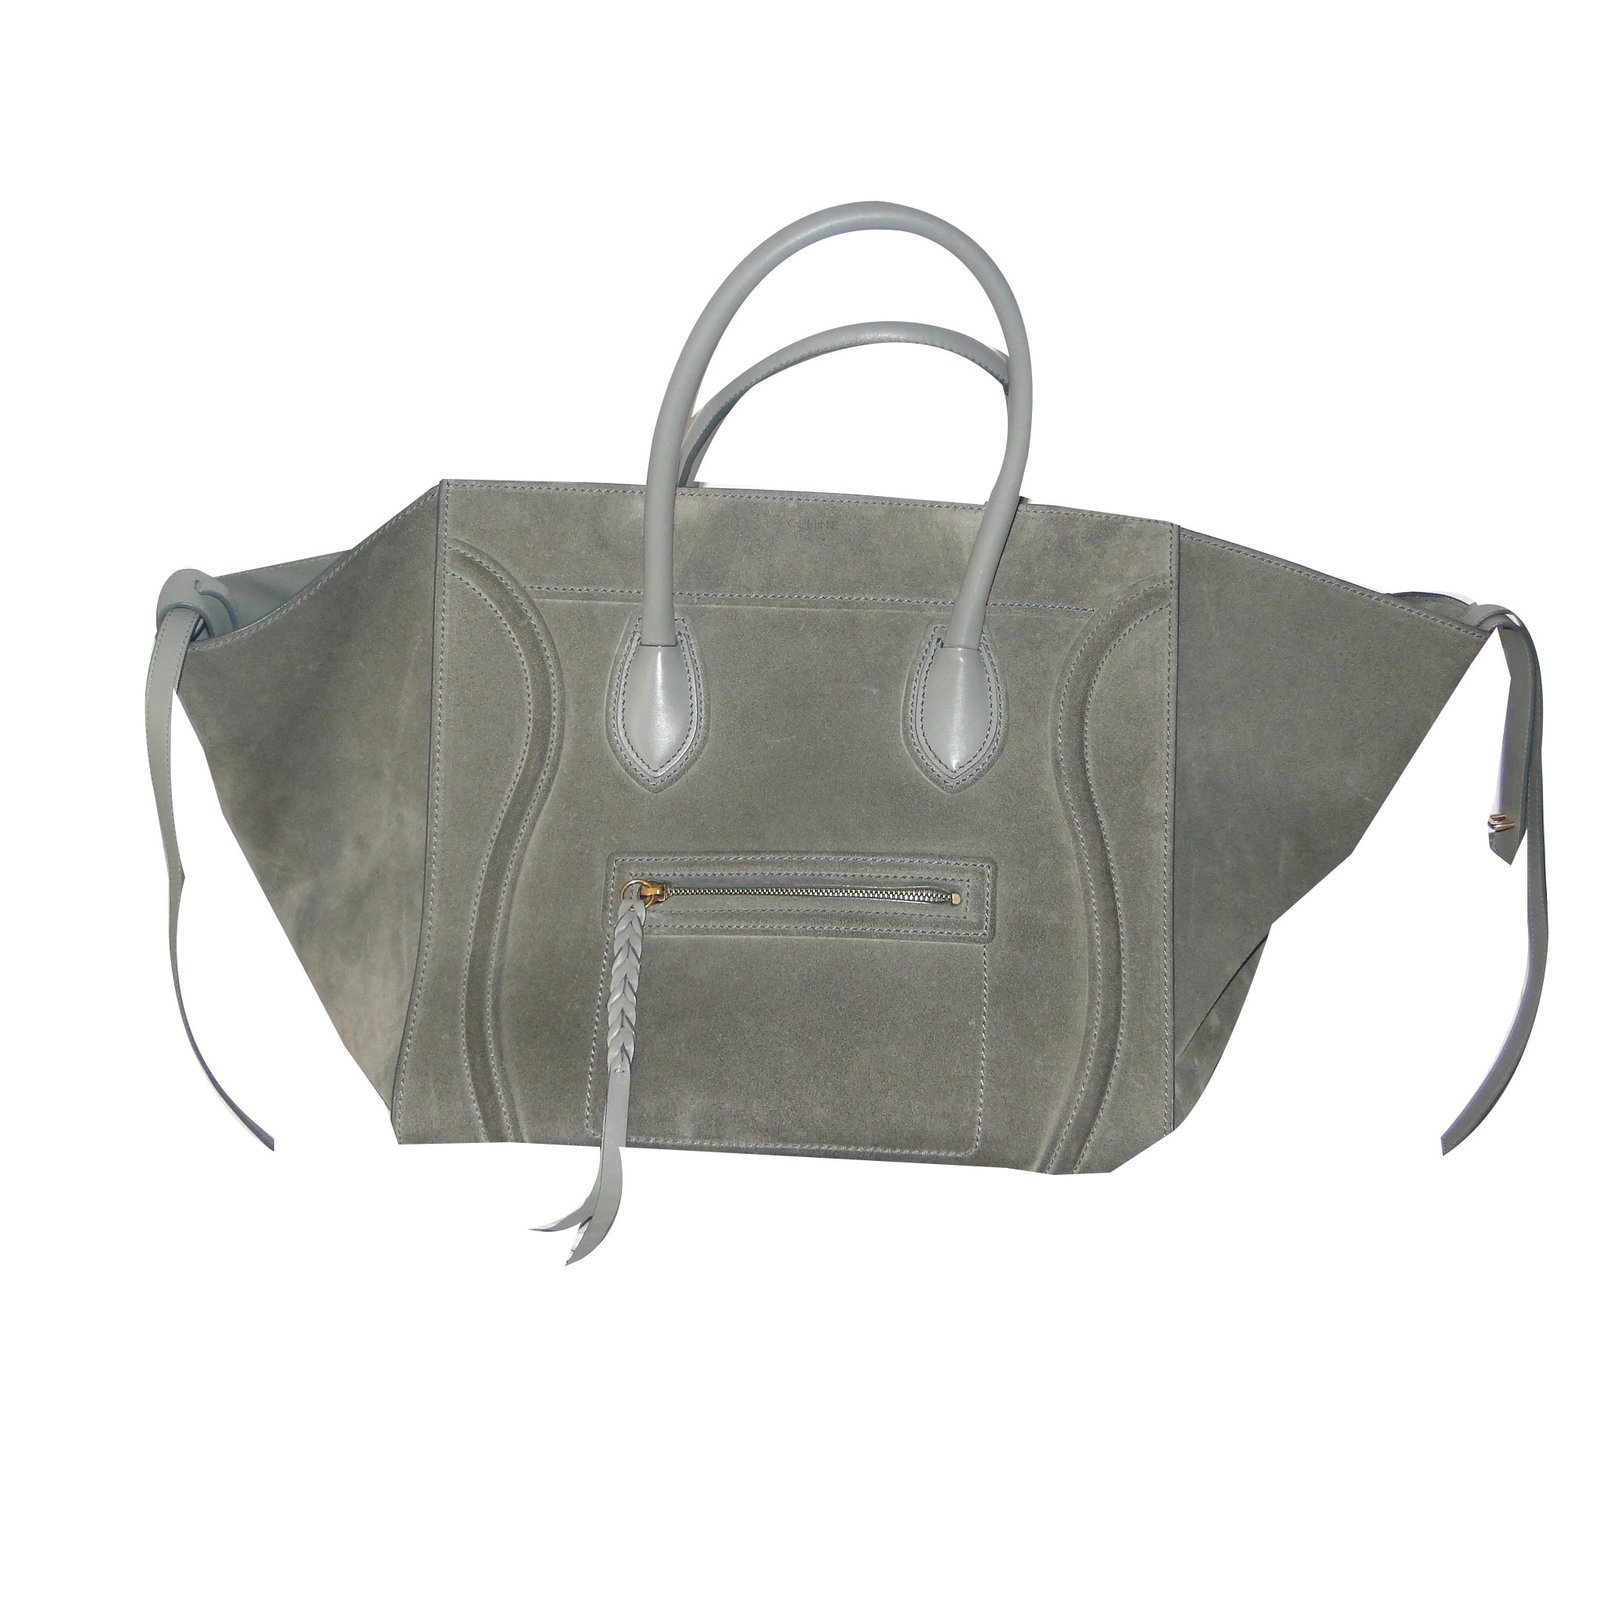 Céline Large luggage PHANTOM Handbags Leather 085153790e732